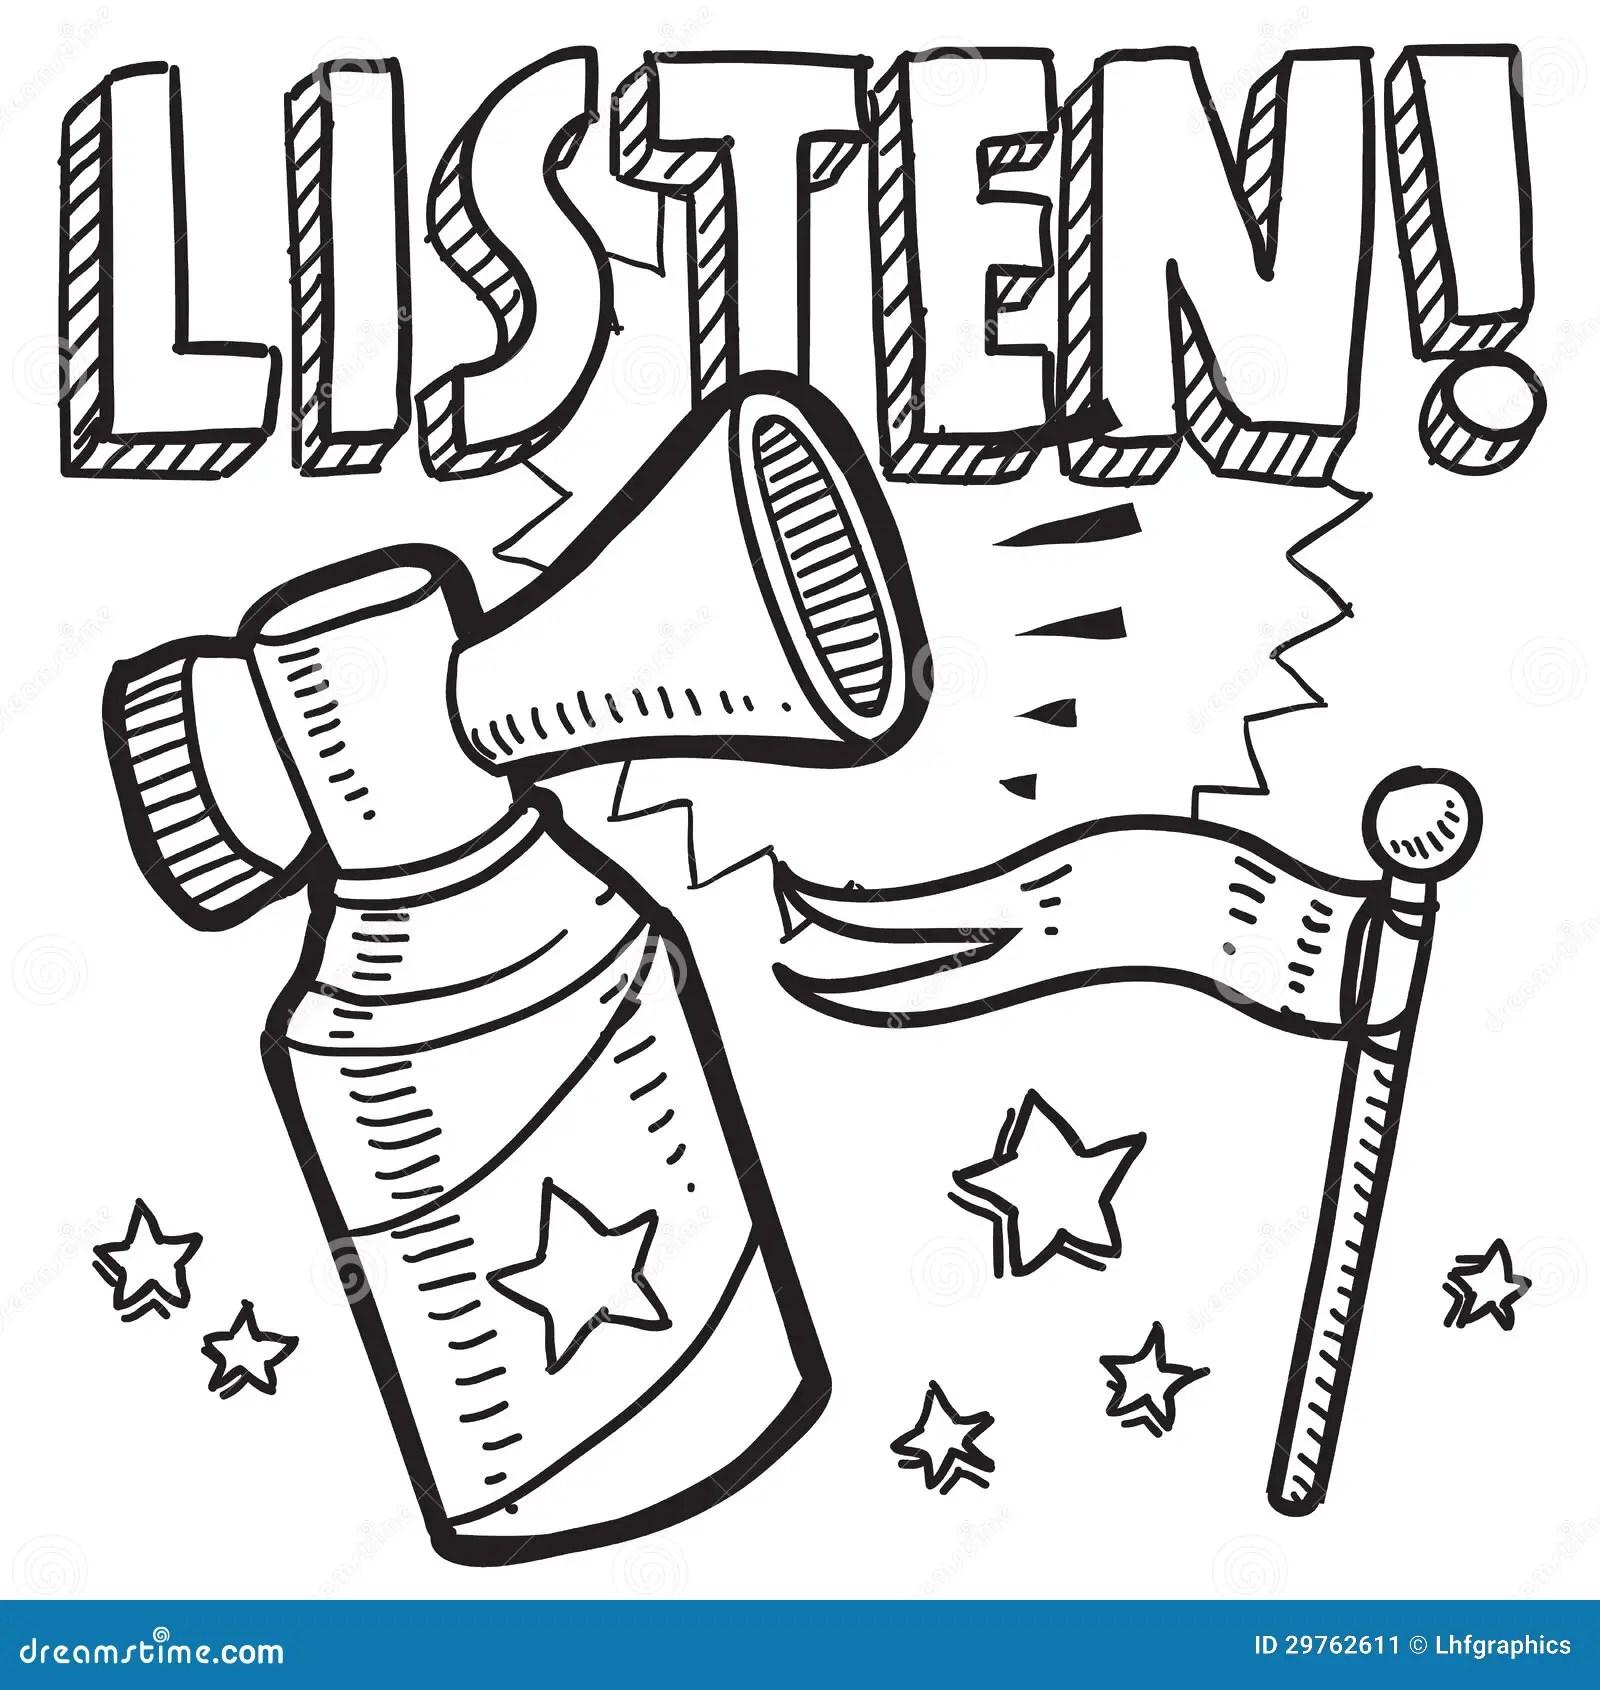 Listen Announcement Sketch Stock Vector Illustration Of